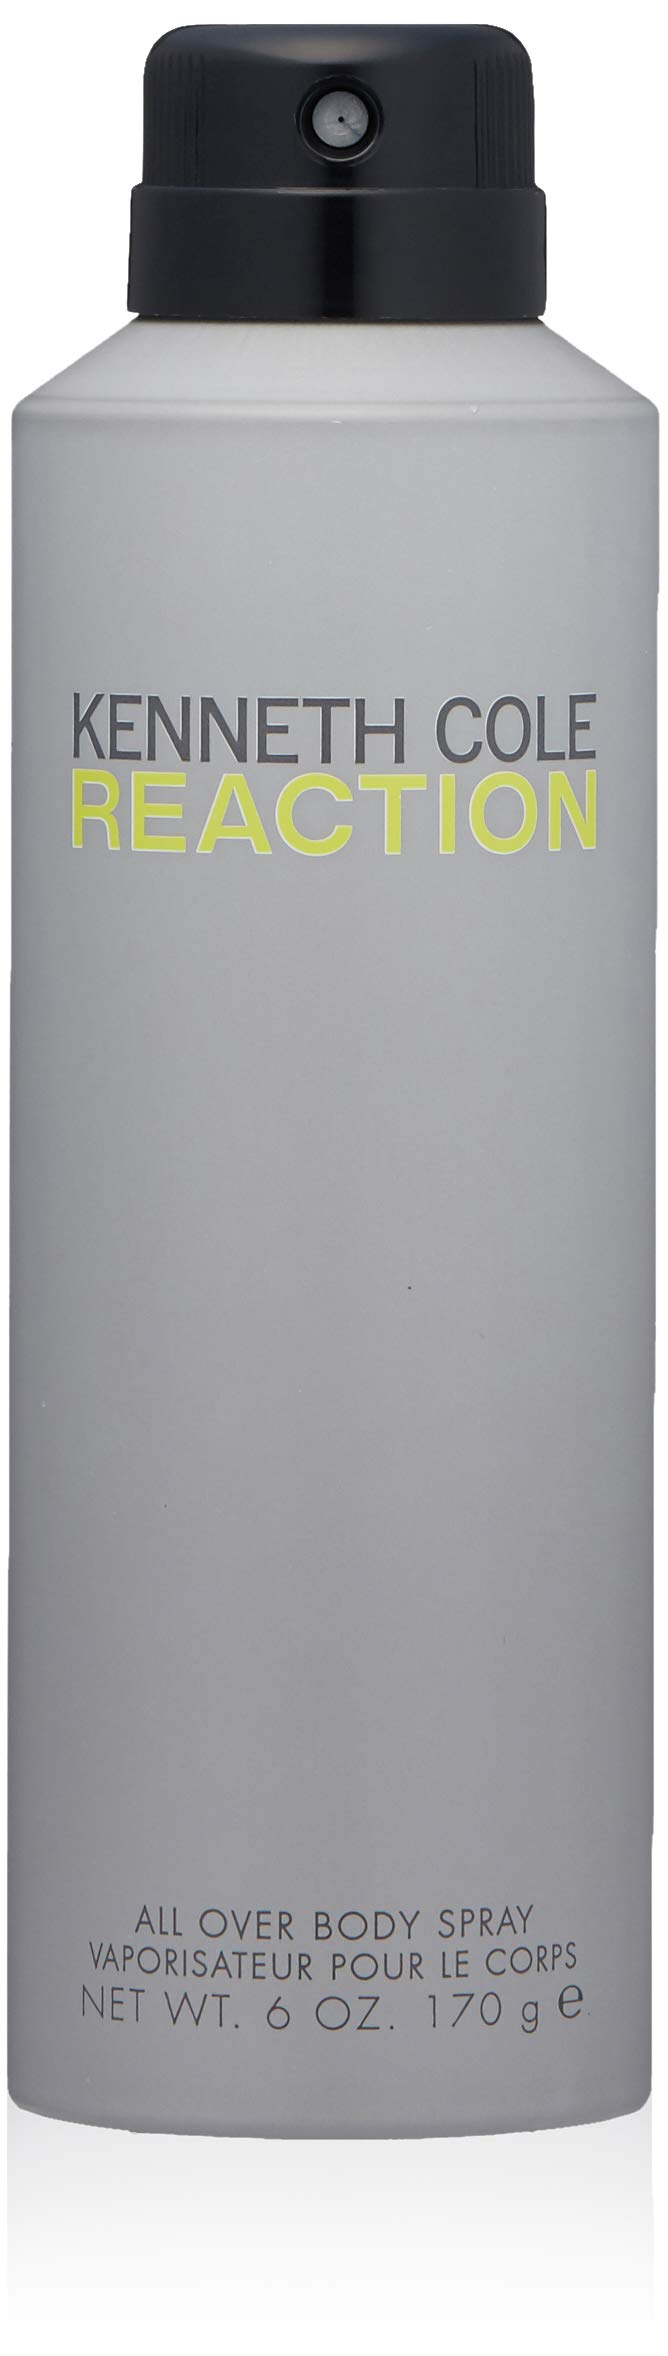 Kenneth Cole Reaction Body Spray, 6.0 Oz